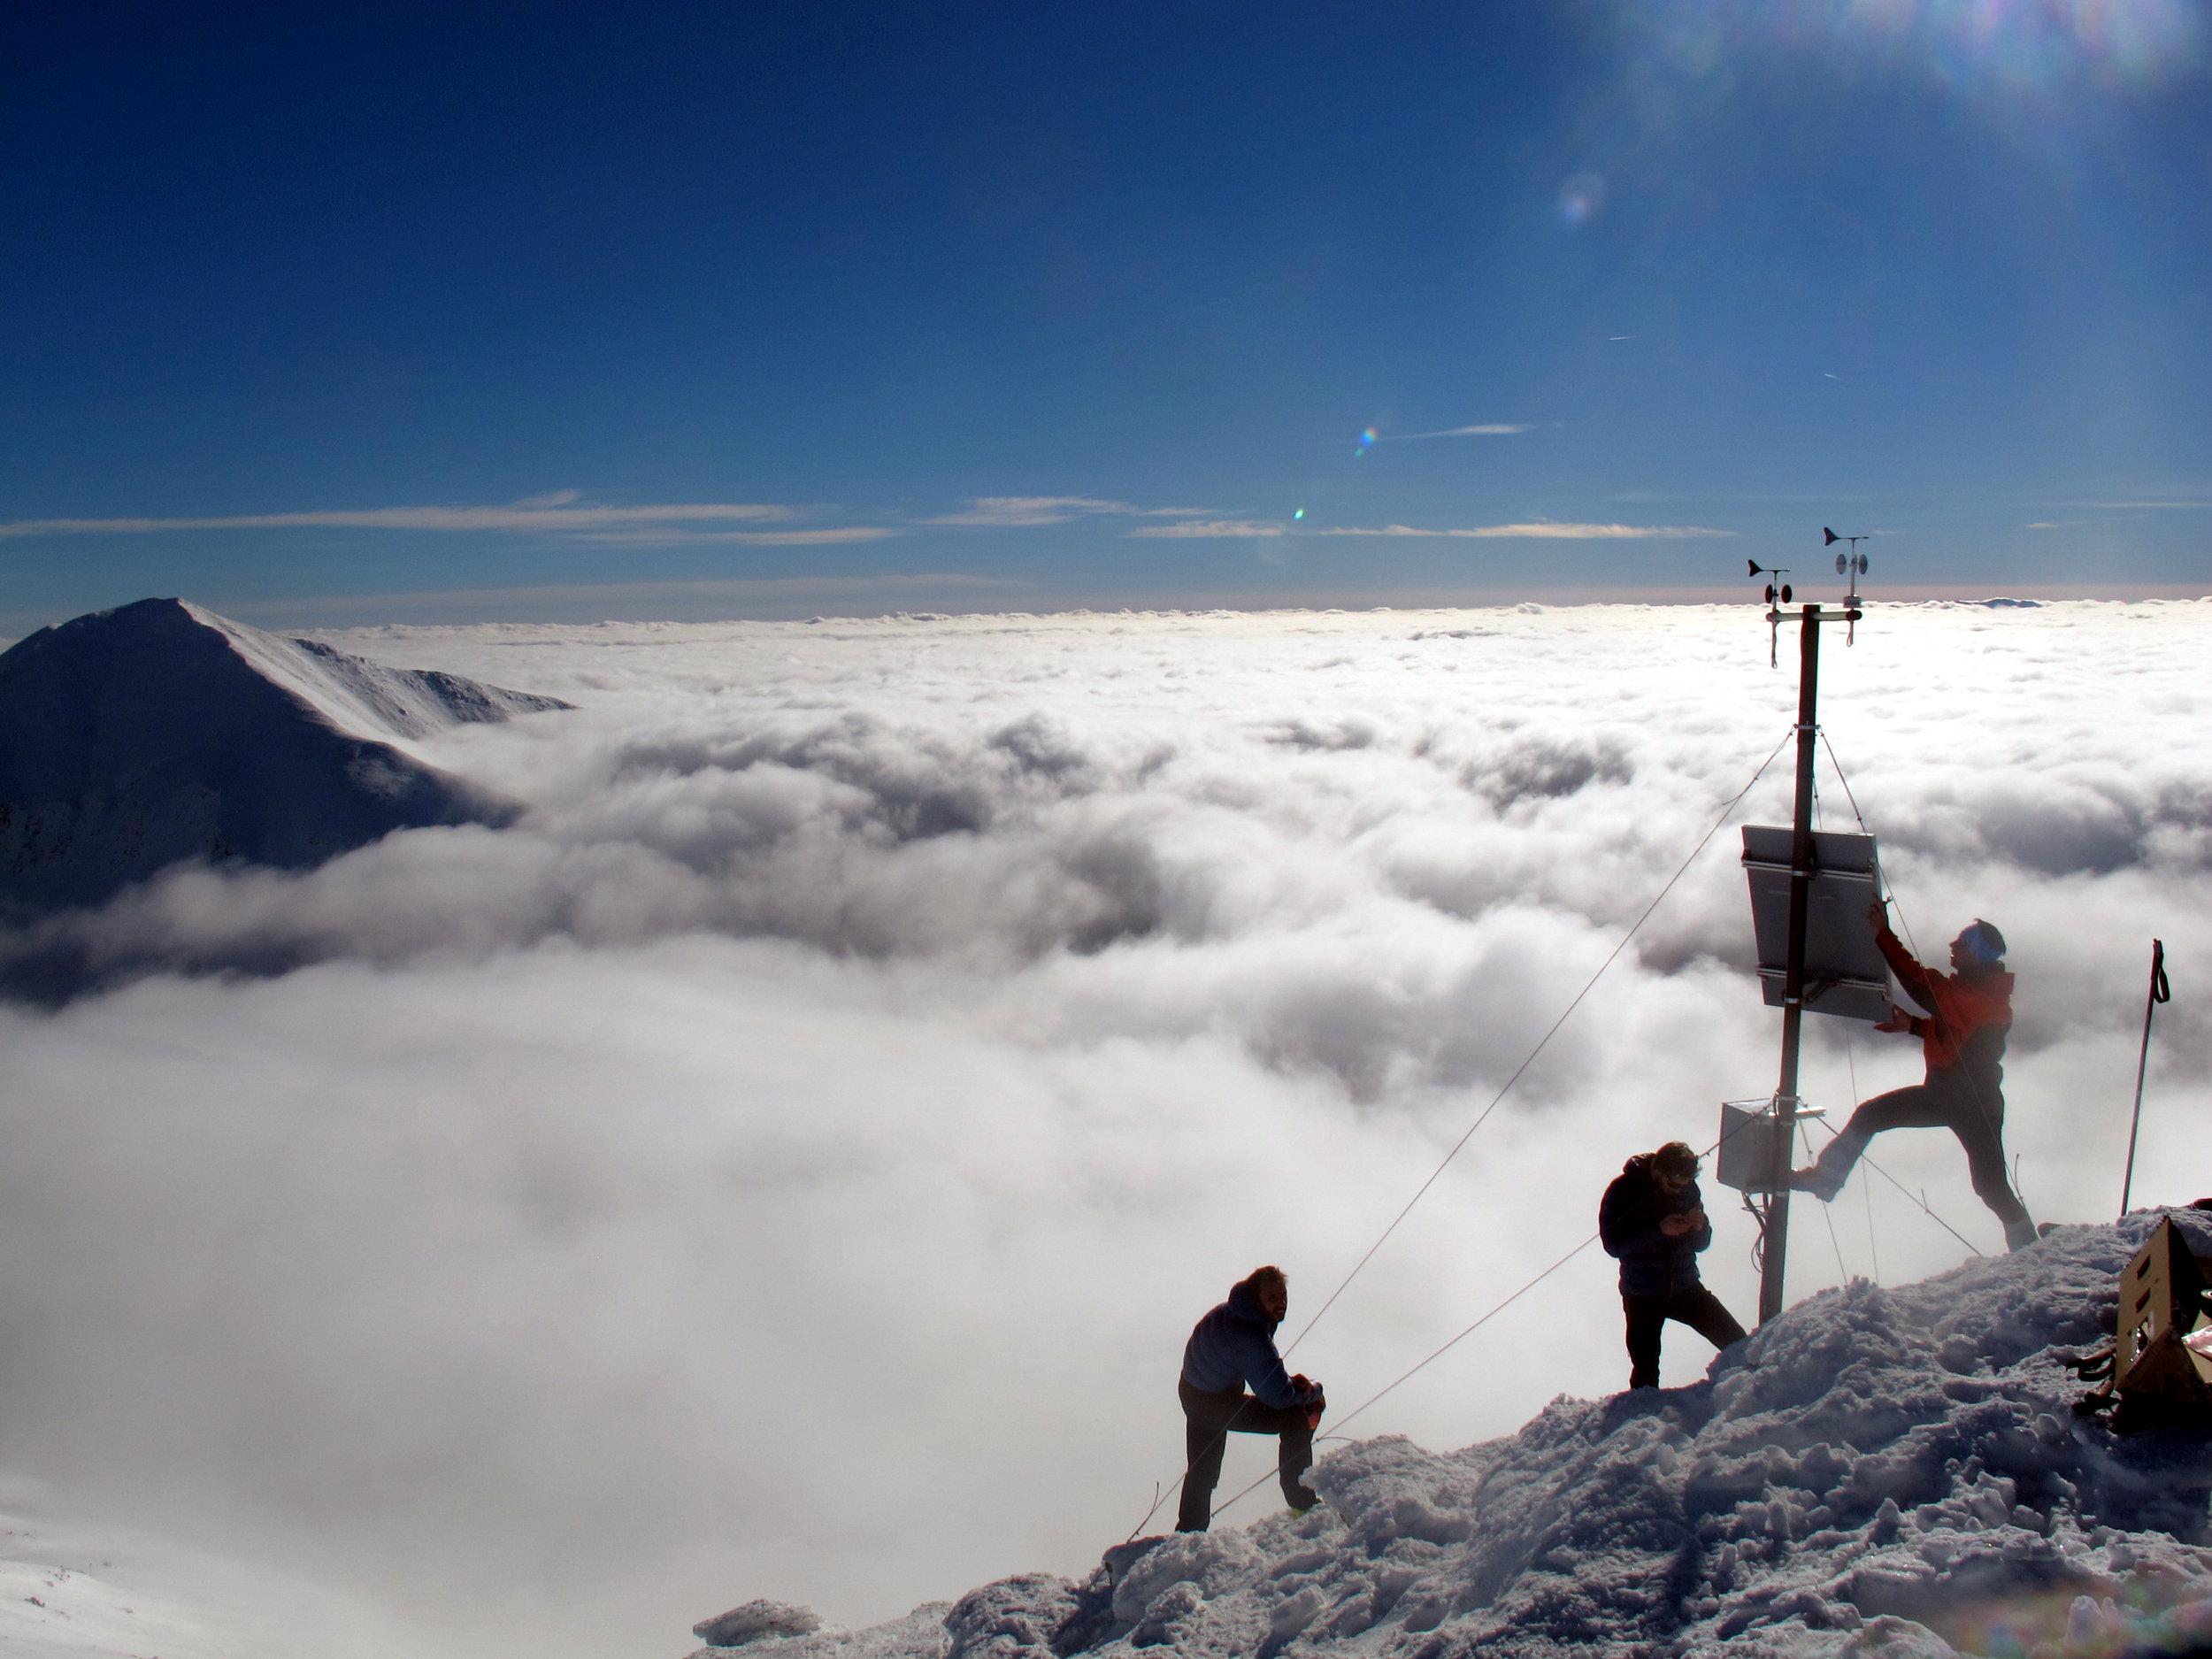 Highest located AWS in Slovakia. Sensor location: High Tatra mountains (Carpathian mountain range), Slovakia.